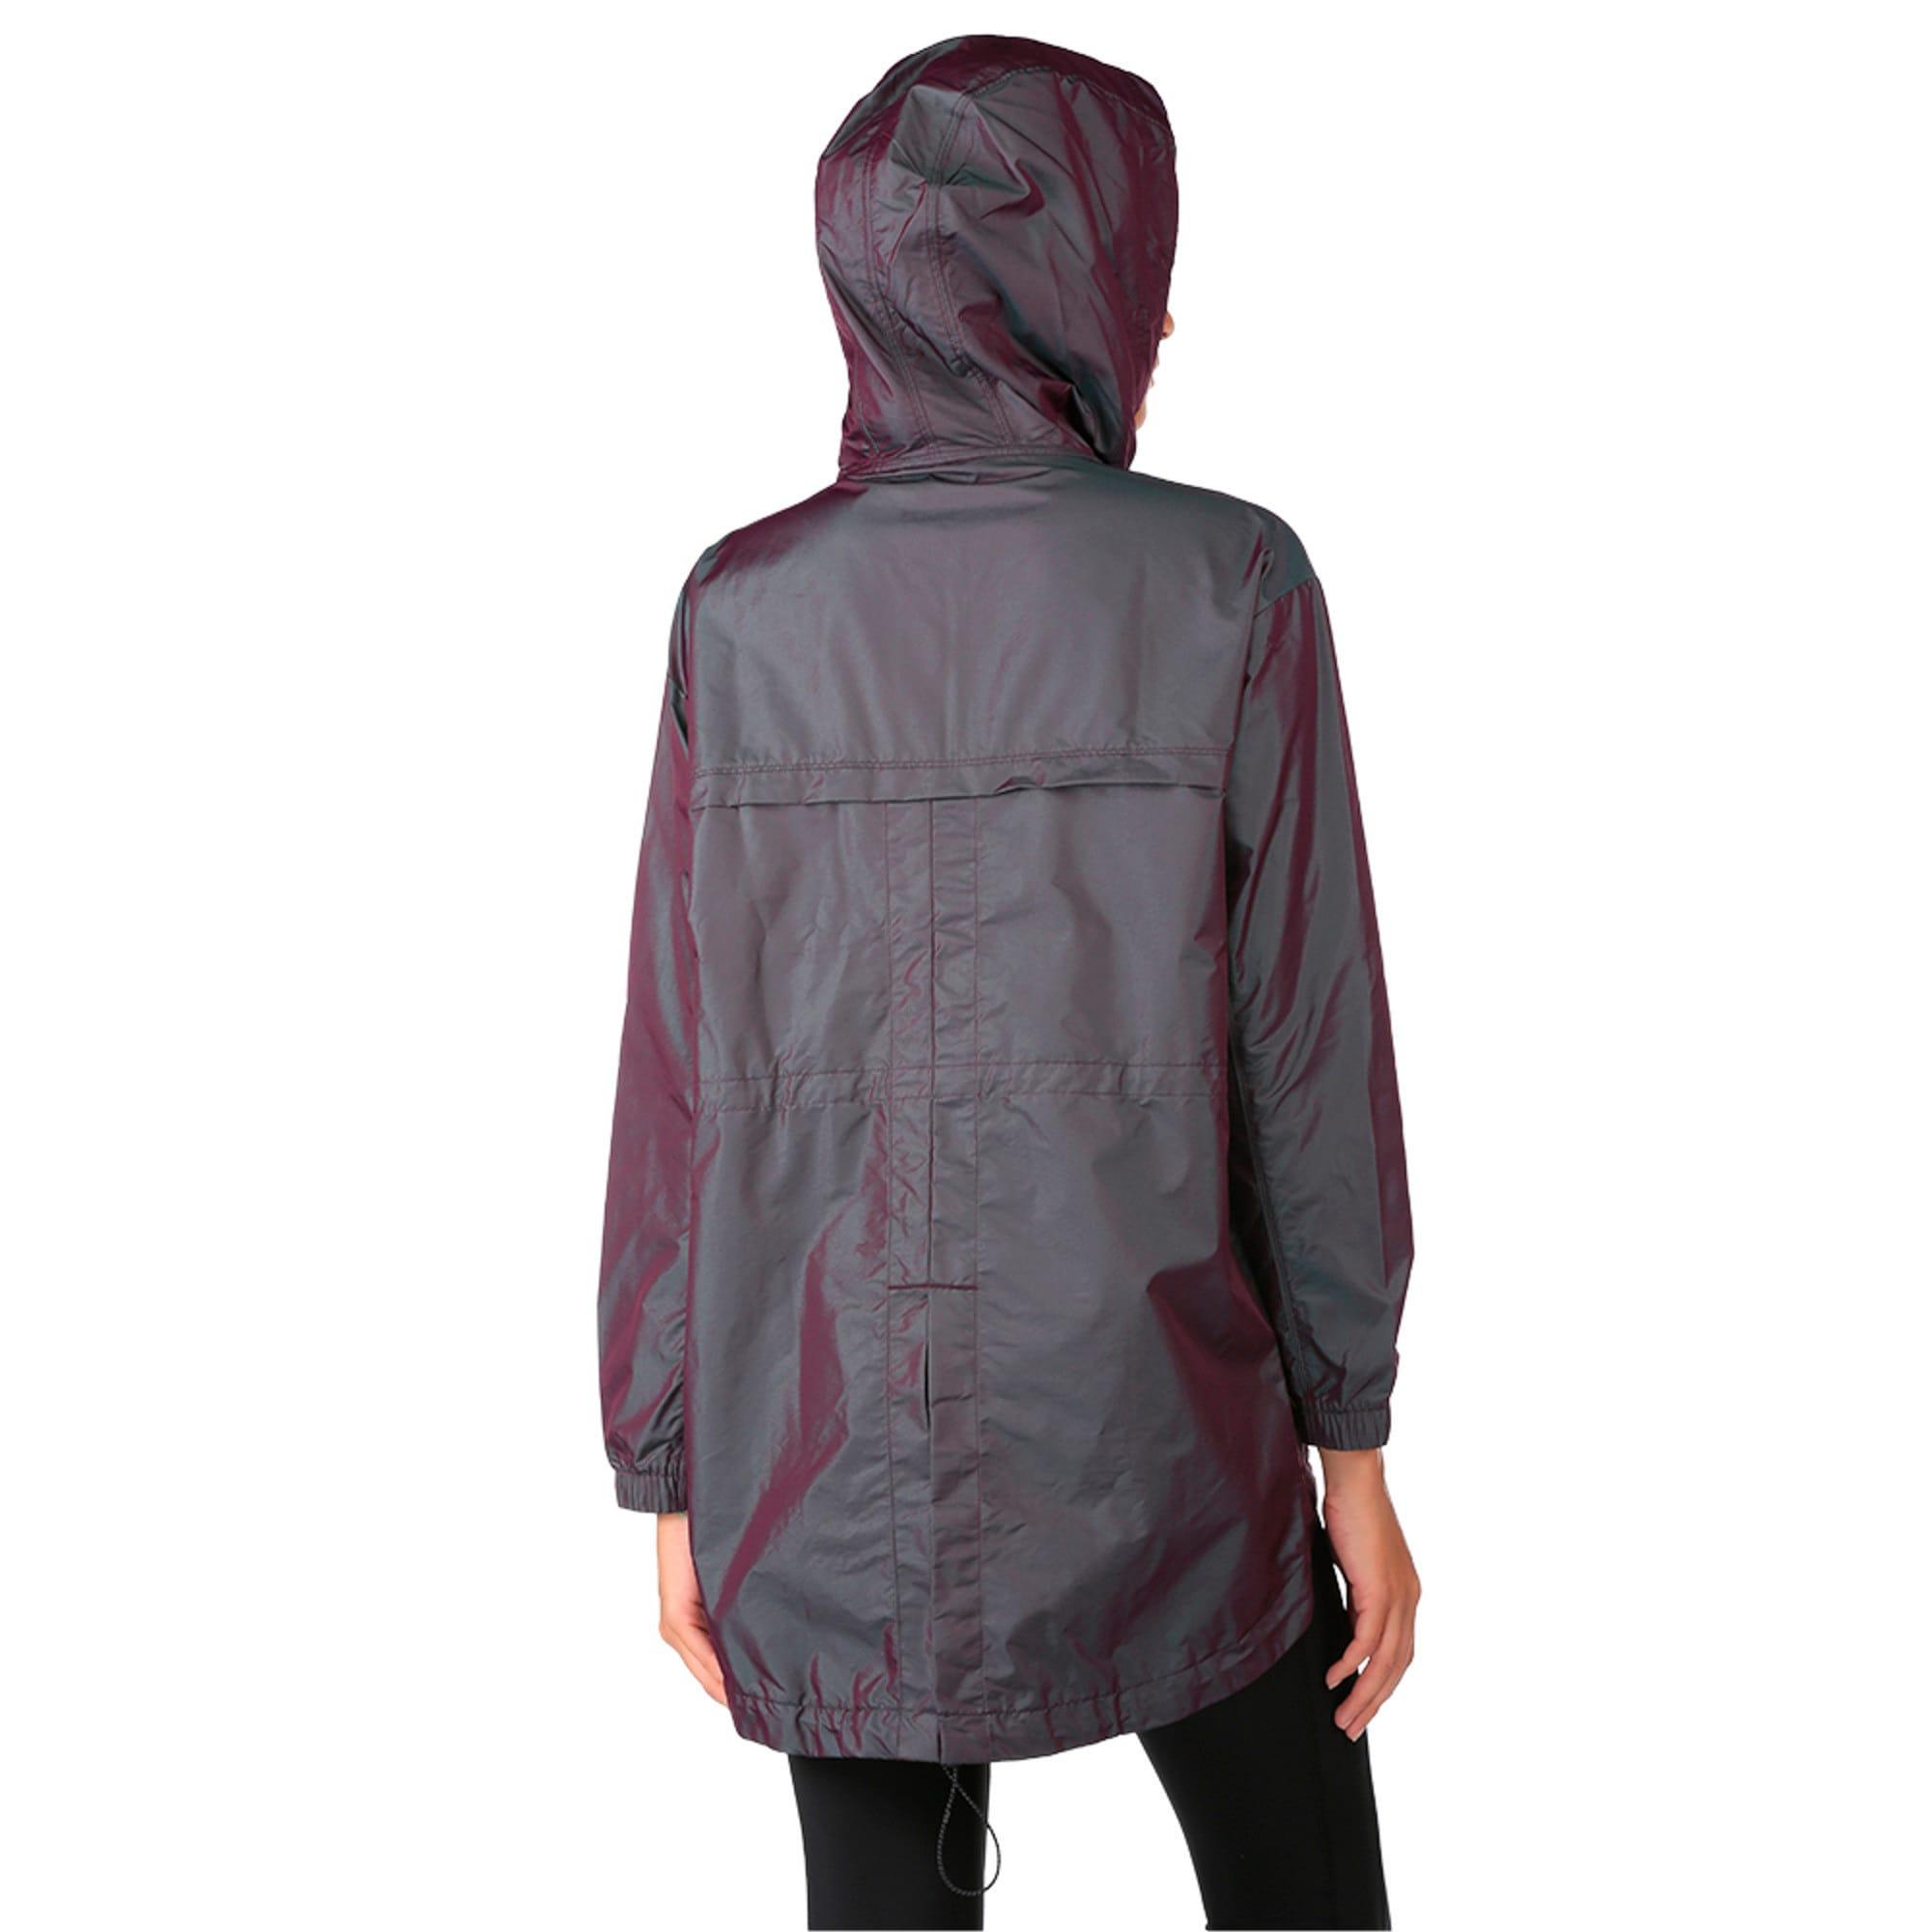 Thumbnail 1 of Active Training Women's Explosive Jacket, Plum Perfect-Iridescent, medium-IND